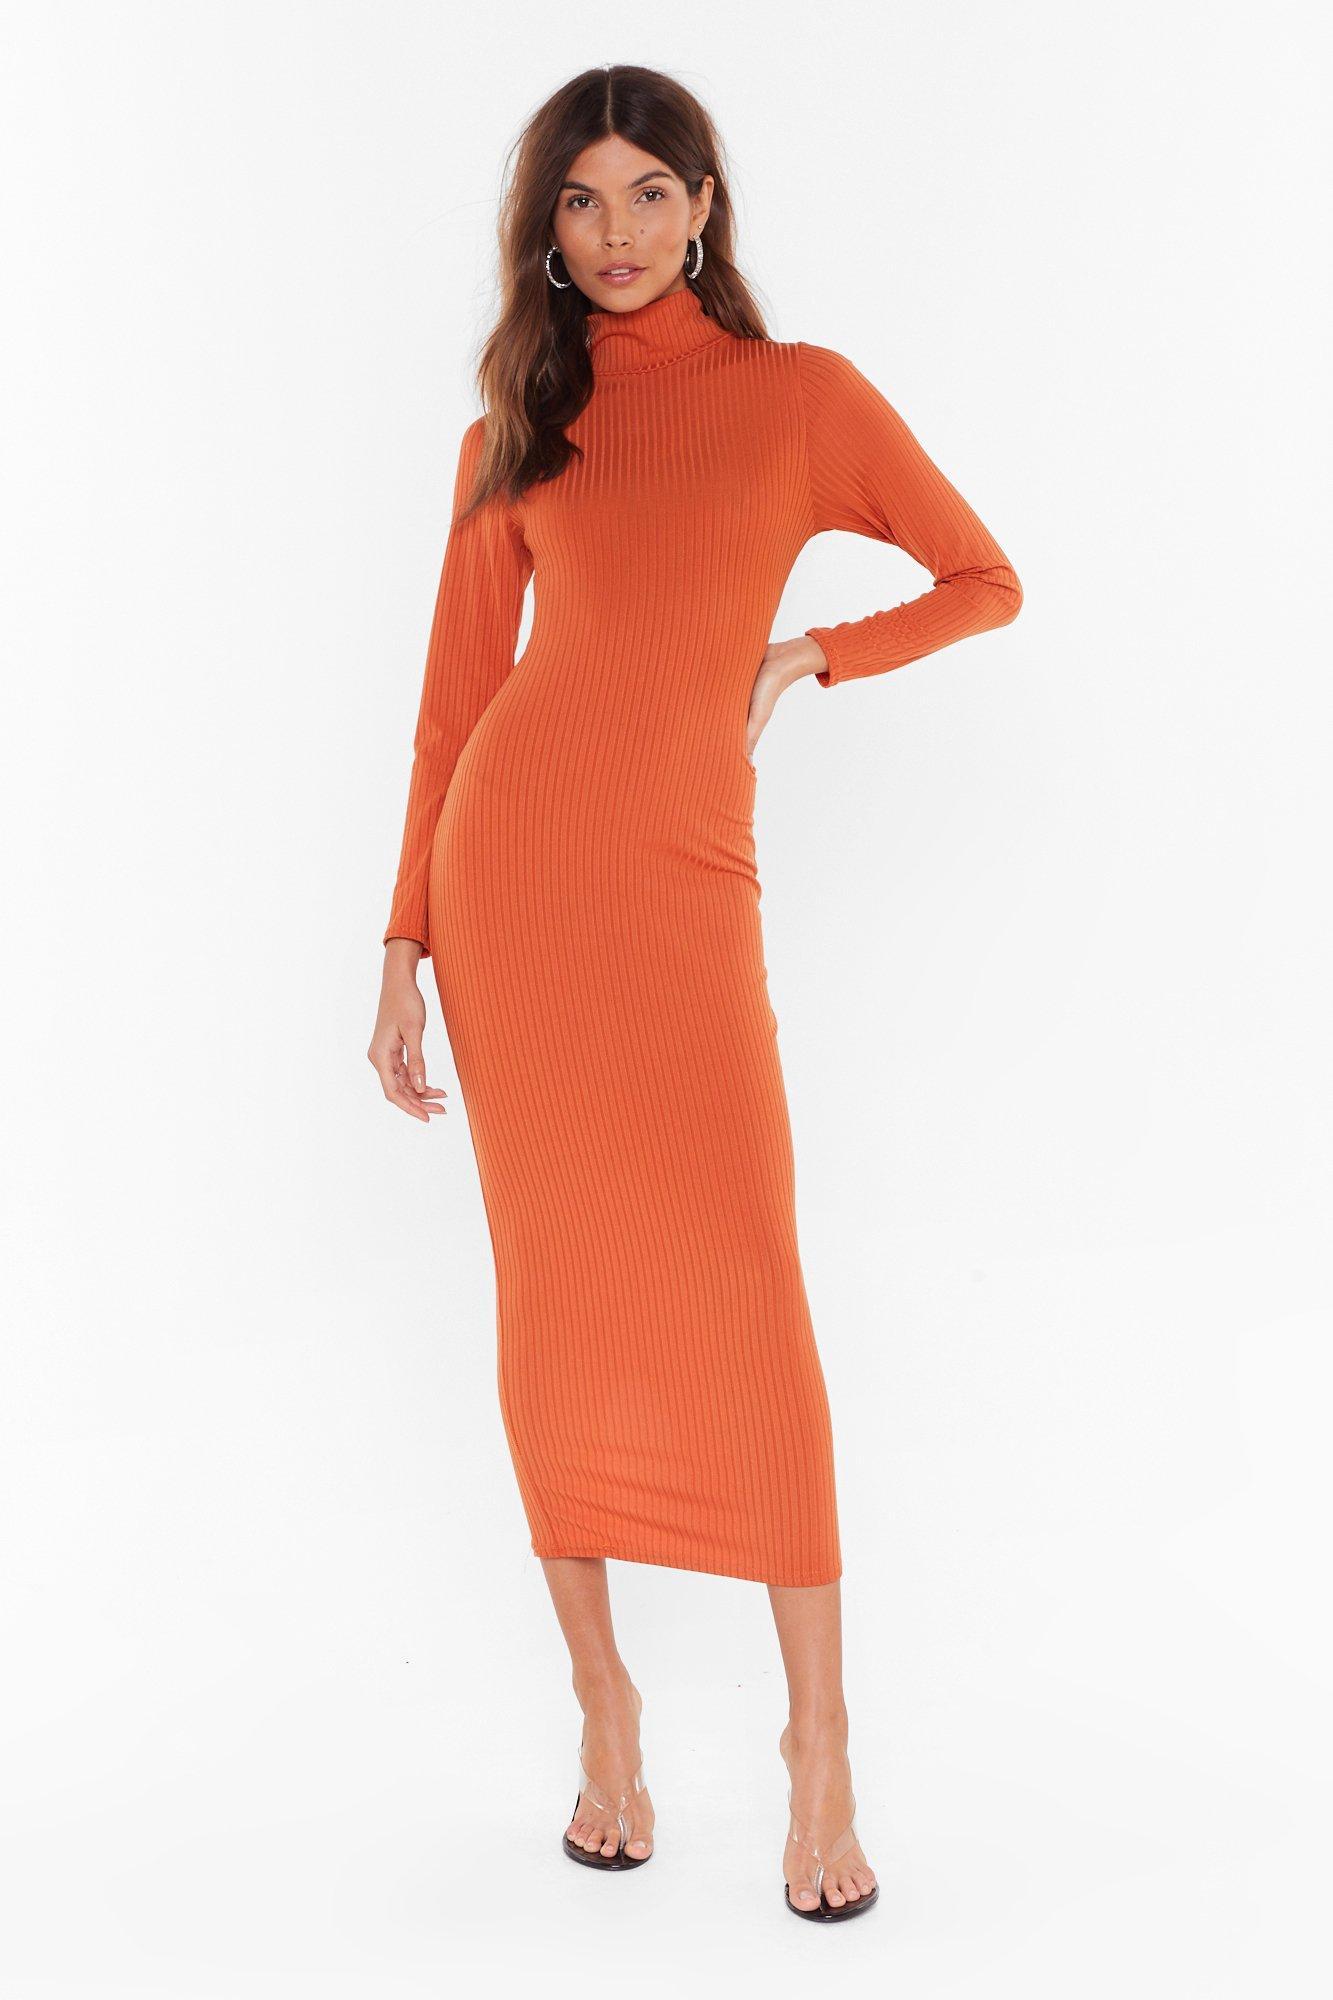 Image of Knit Won't Take Long Turtleneck Midi Dress